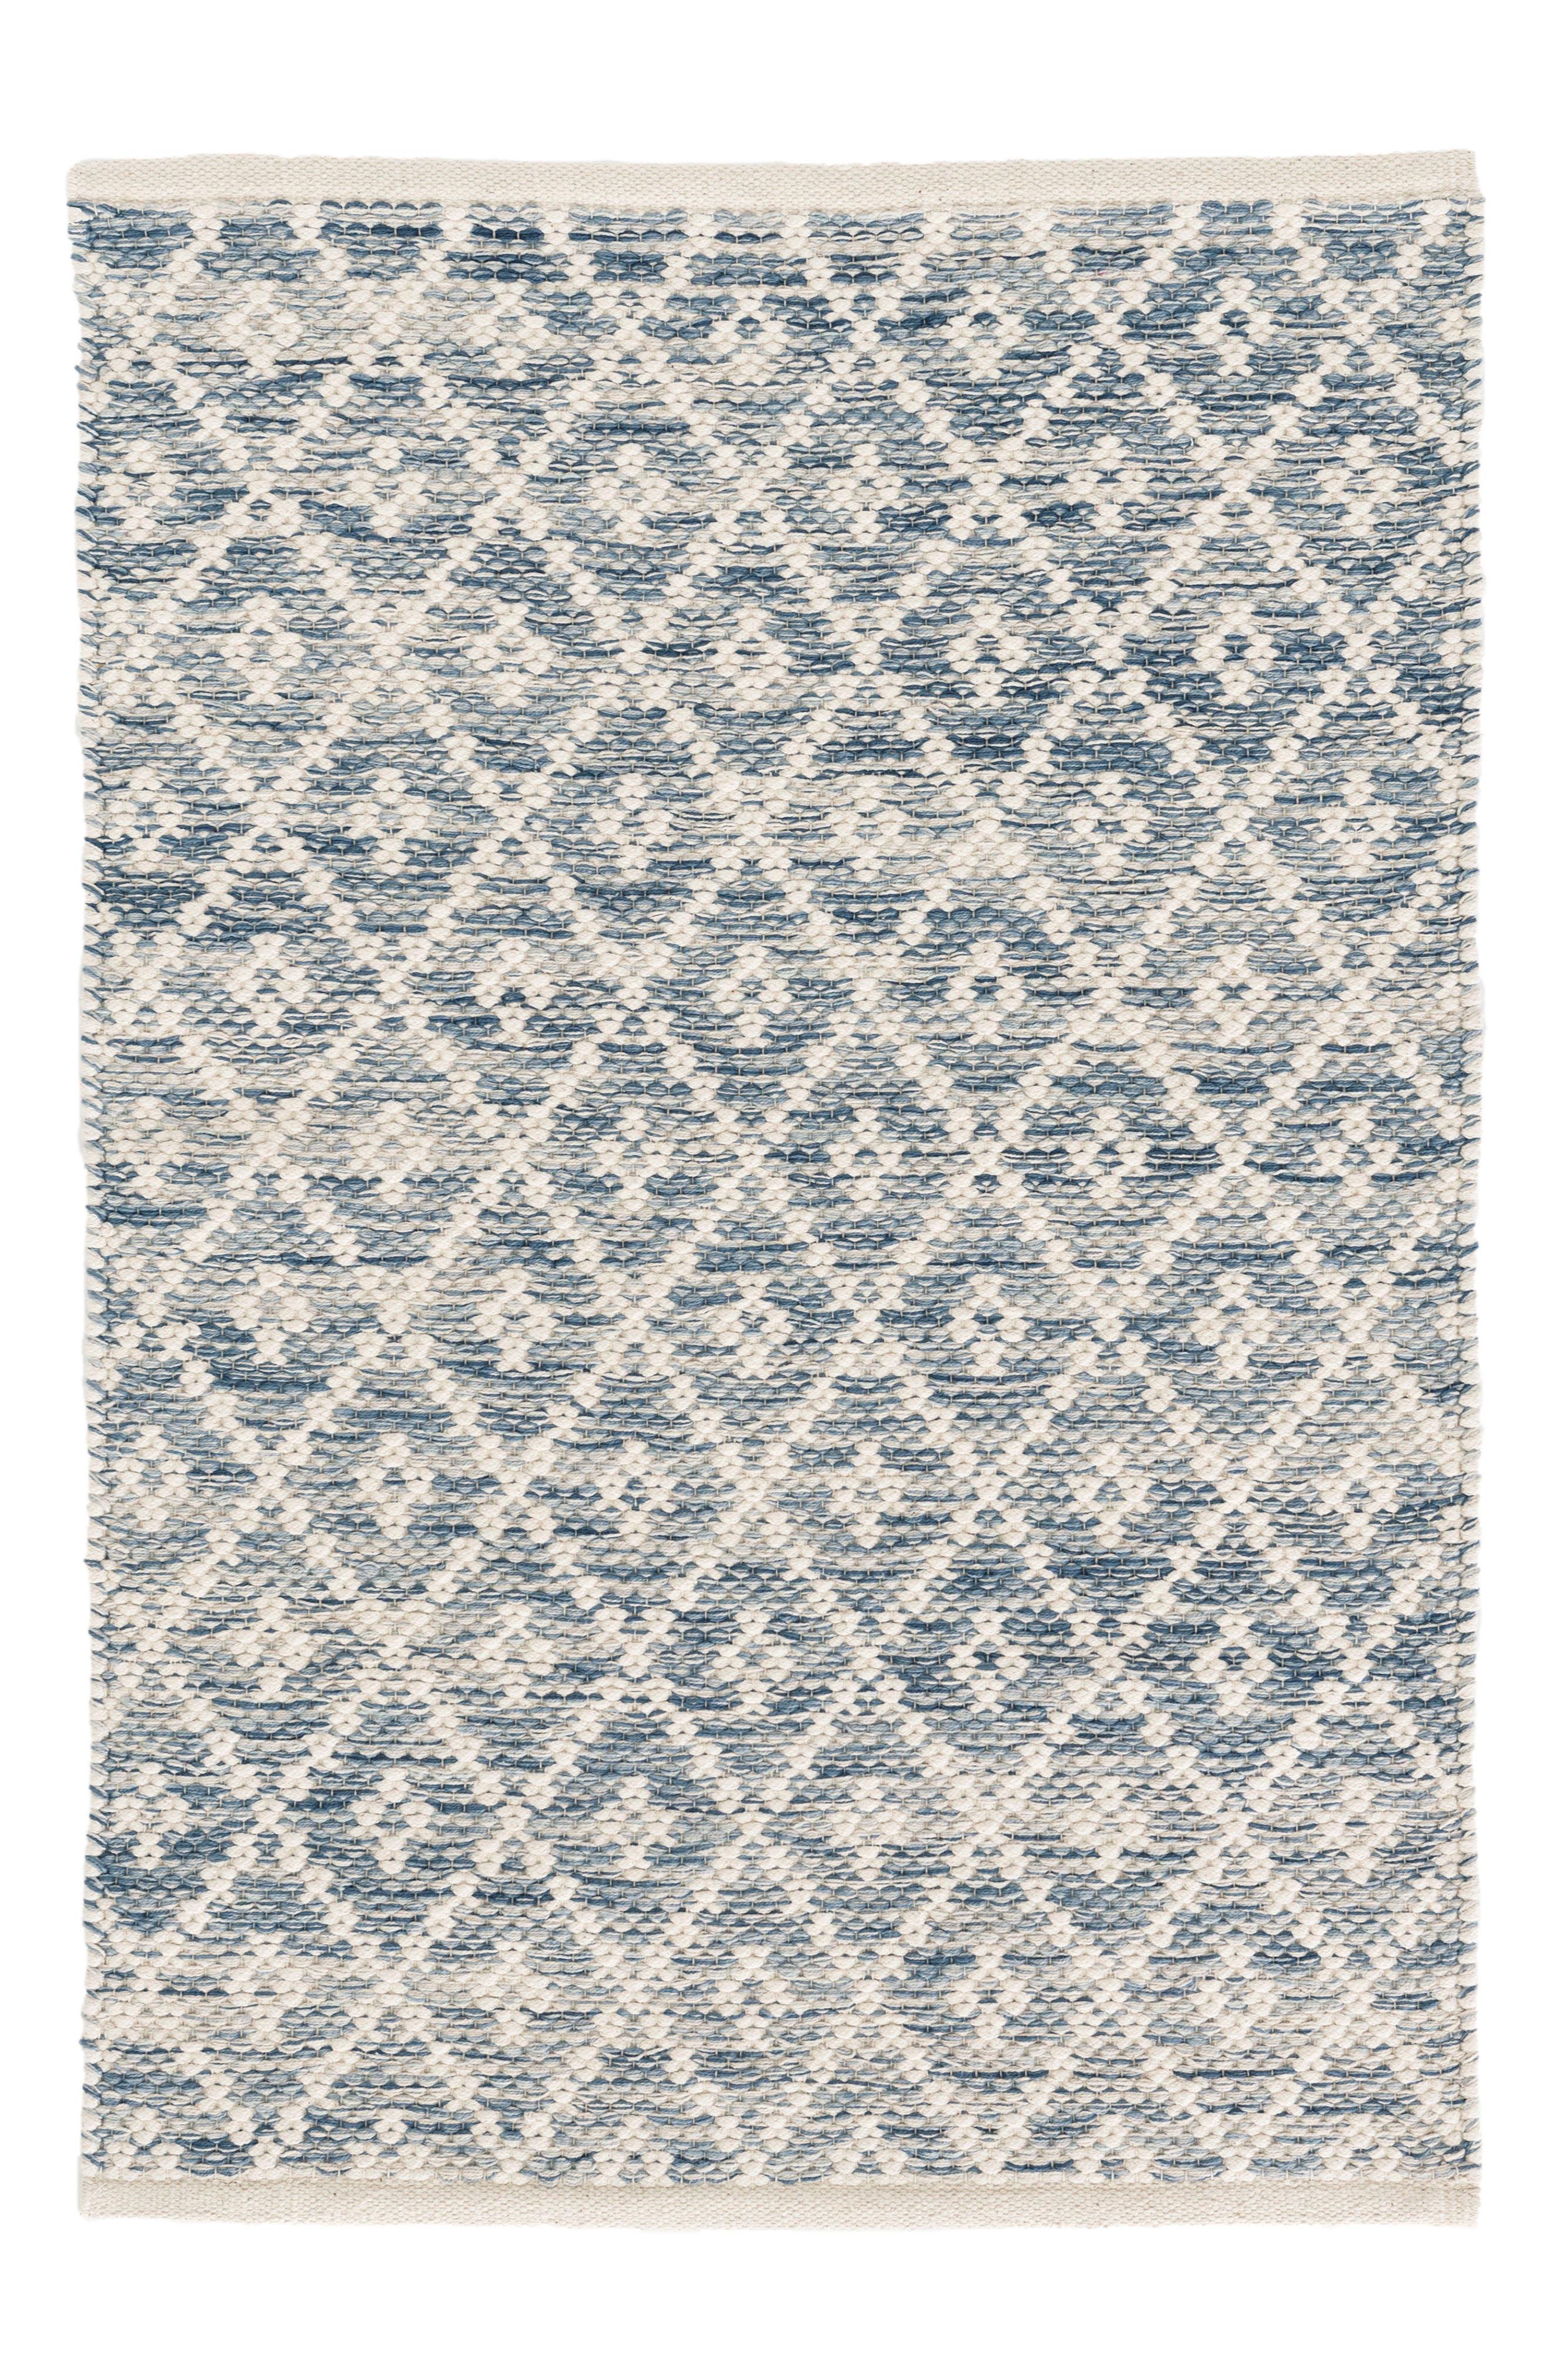 Main Image - Dash & Albert Melange Diamond Woven Rug